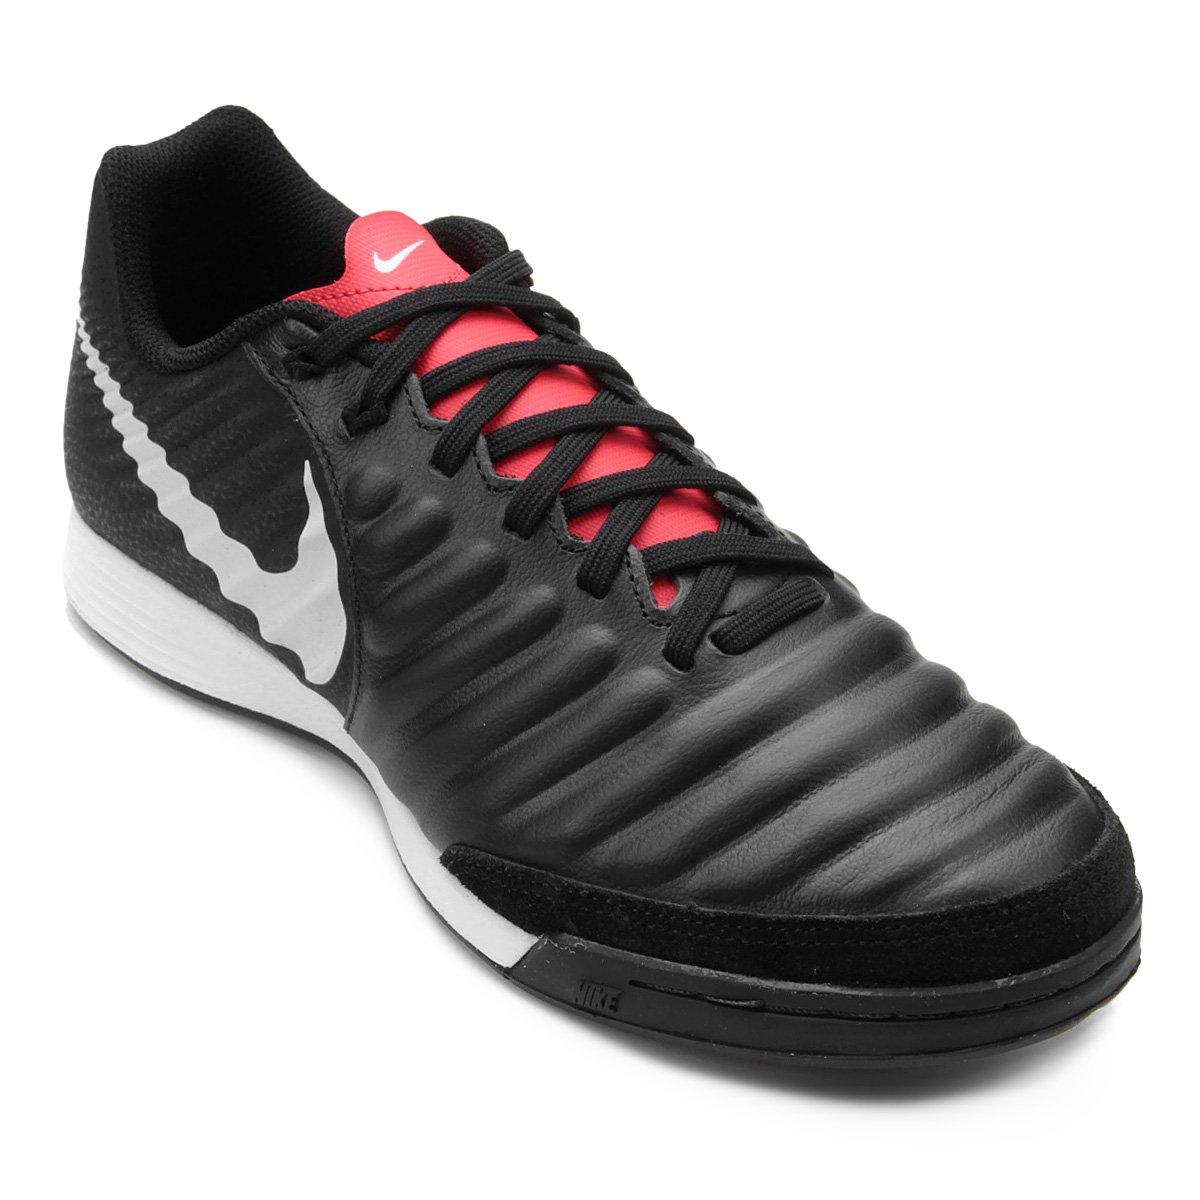 4a7204a91c Chuteira Futsal Nike Tiempo Legend 7 Academy IC - Preto e Cinza ...